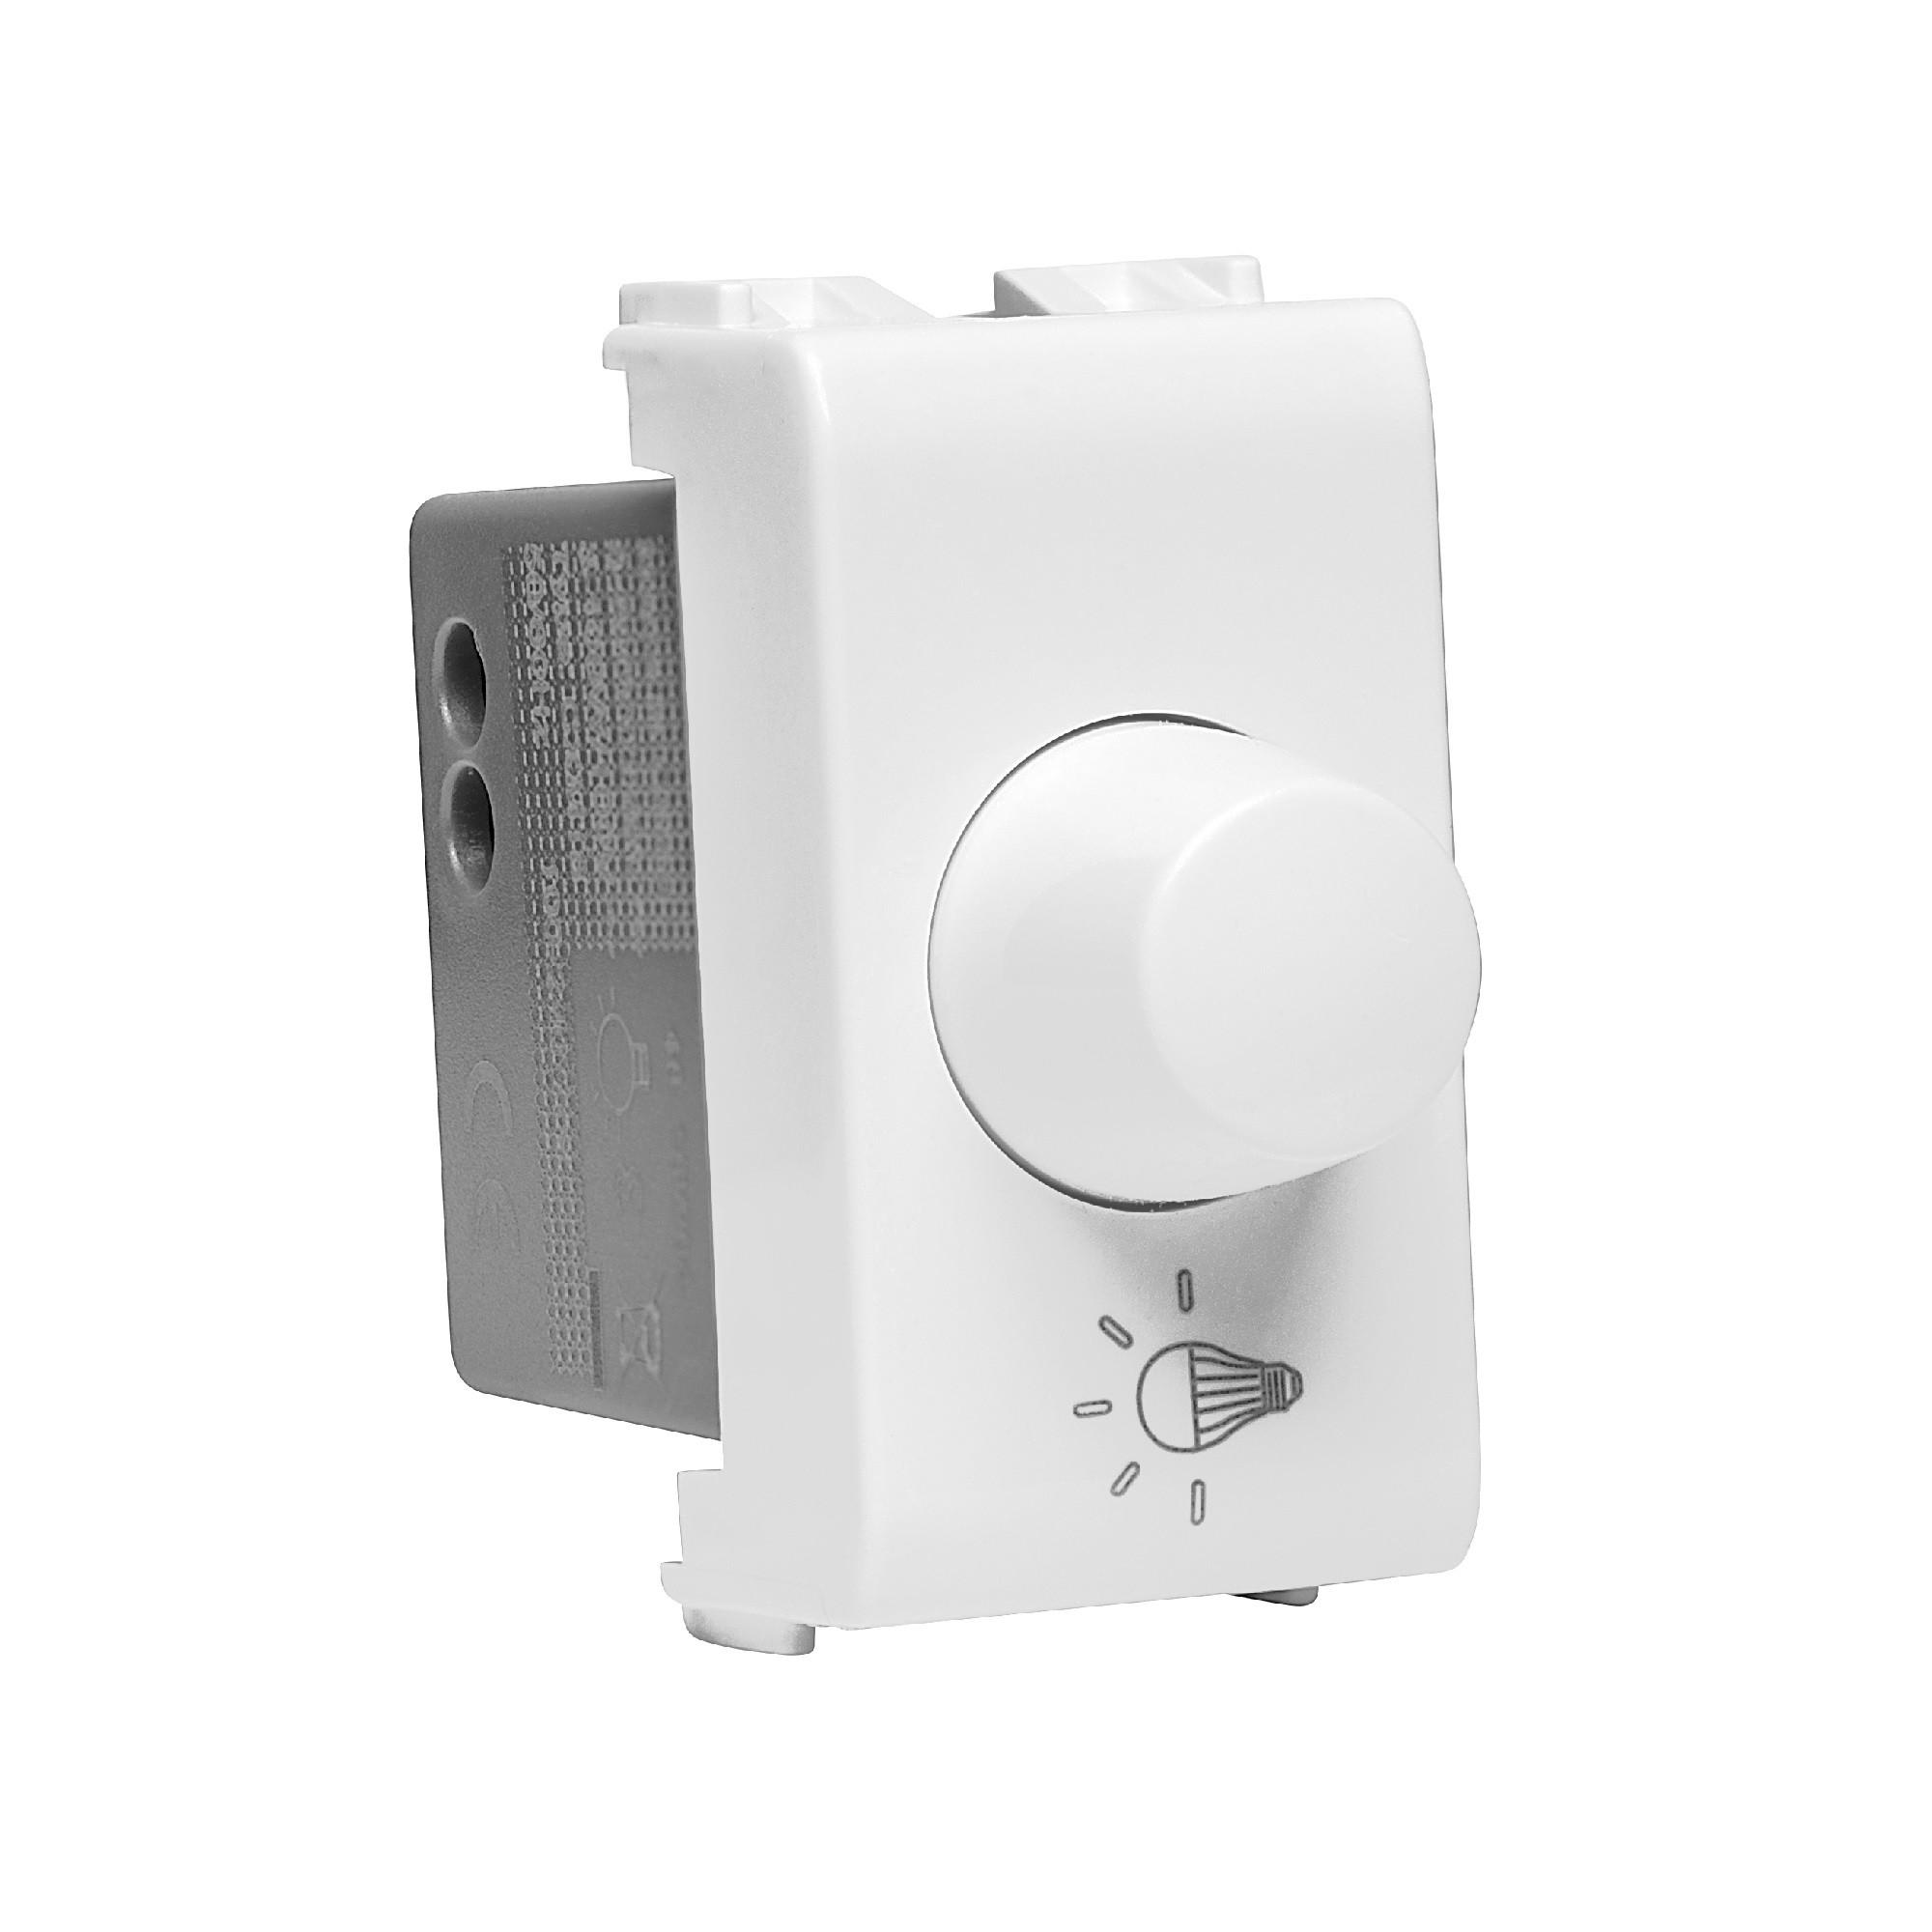 Variador de Luminosidade Rotativo Modular de Embutir Bivolt - Thesi - Bticino